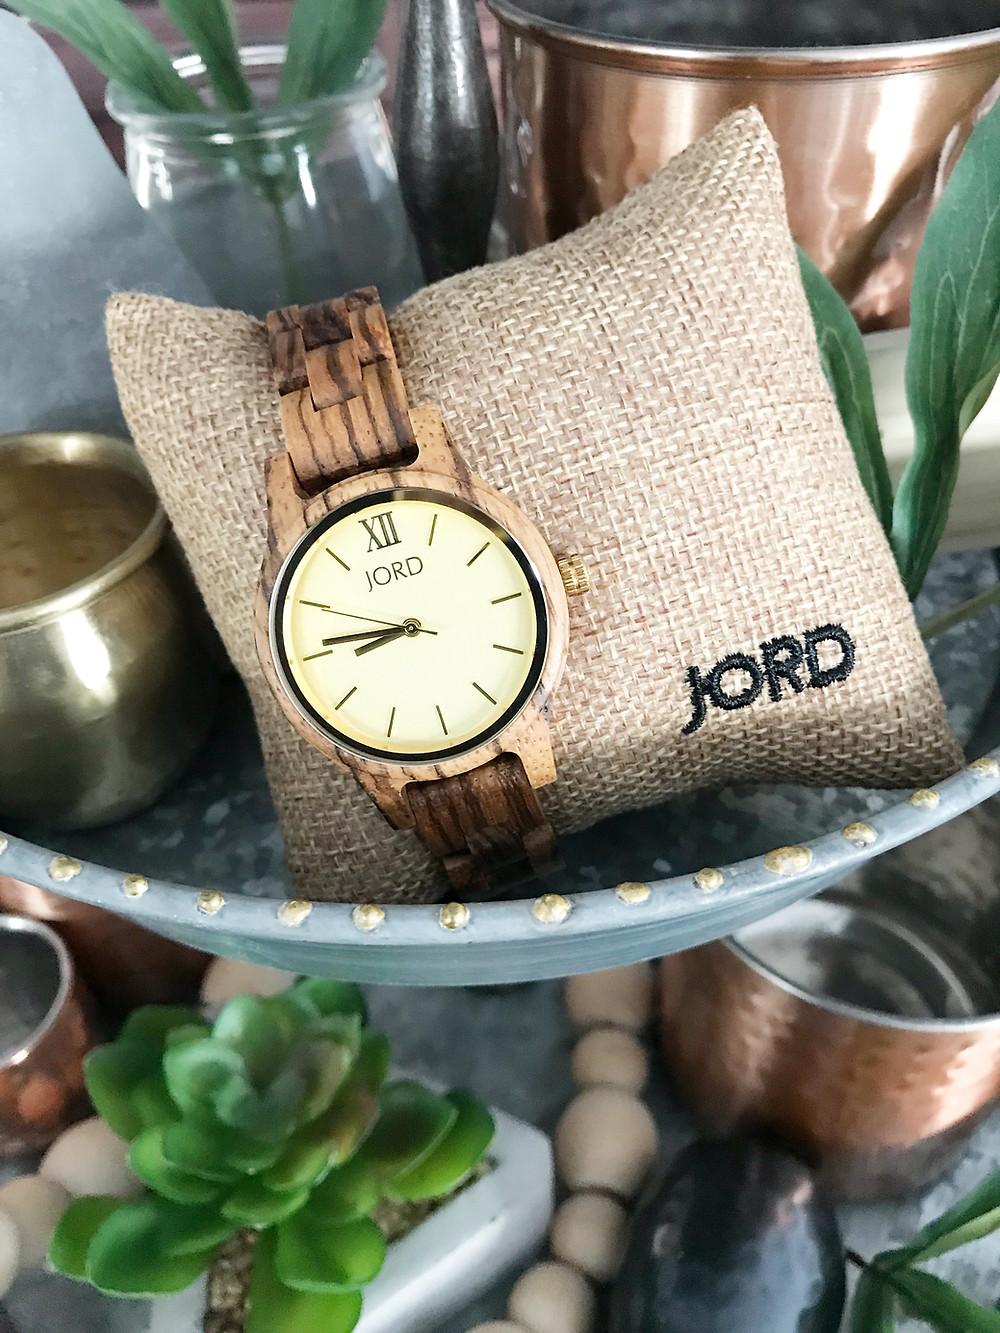 "{C}{C}{C}{C}{C}{C}{C}<!-- JORD WOOD WATCHES ARTICLE WIDGET START --> <a id=""woodwatches_com_widget_article""  ishidden=""1""  title=""Wooden Wrist Watch"">Wooden Wrist Watch</a>  {C}{C}{C}{C}{C}{C}{C}<!-- JORD WOOD WATCHES ARTICLE WIDGET END -->"